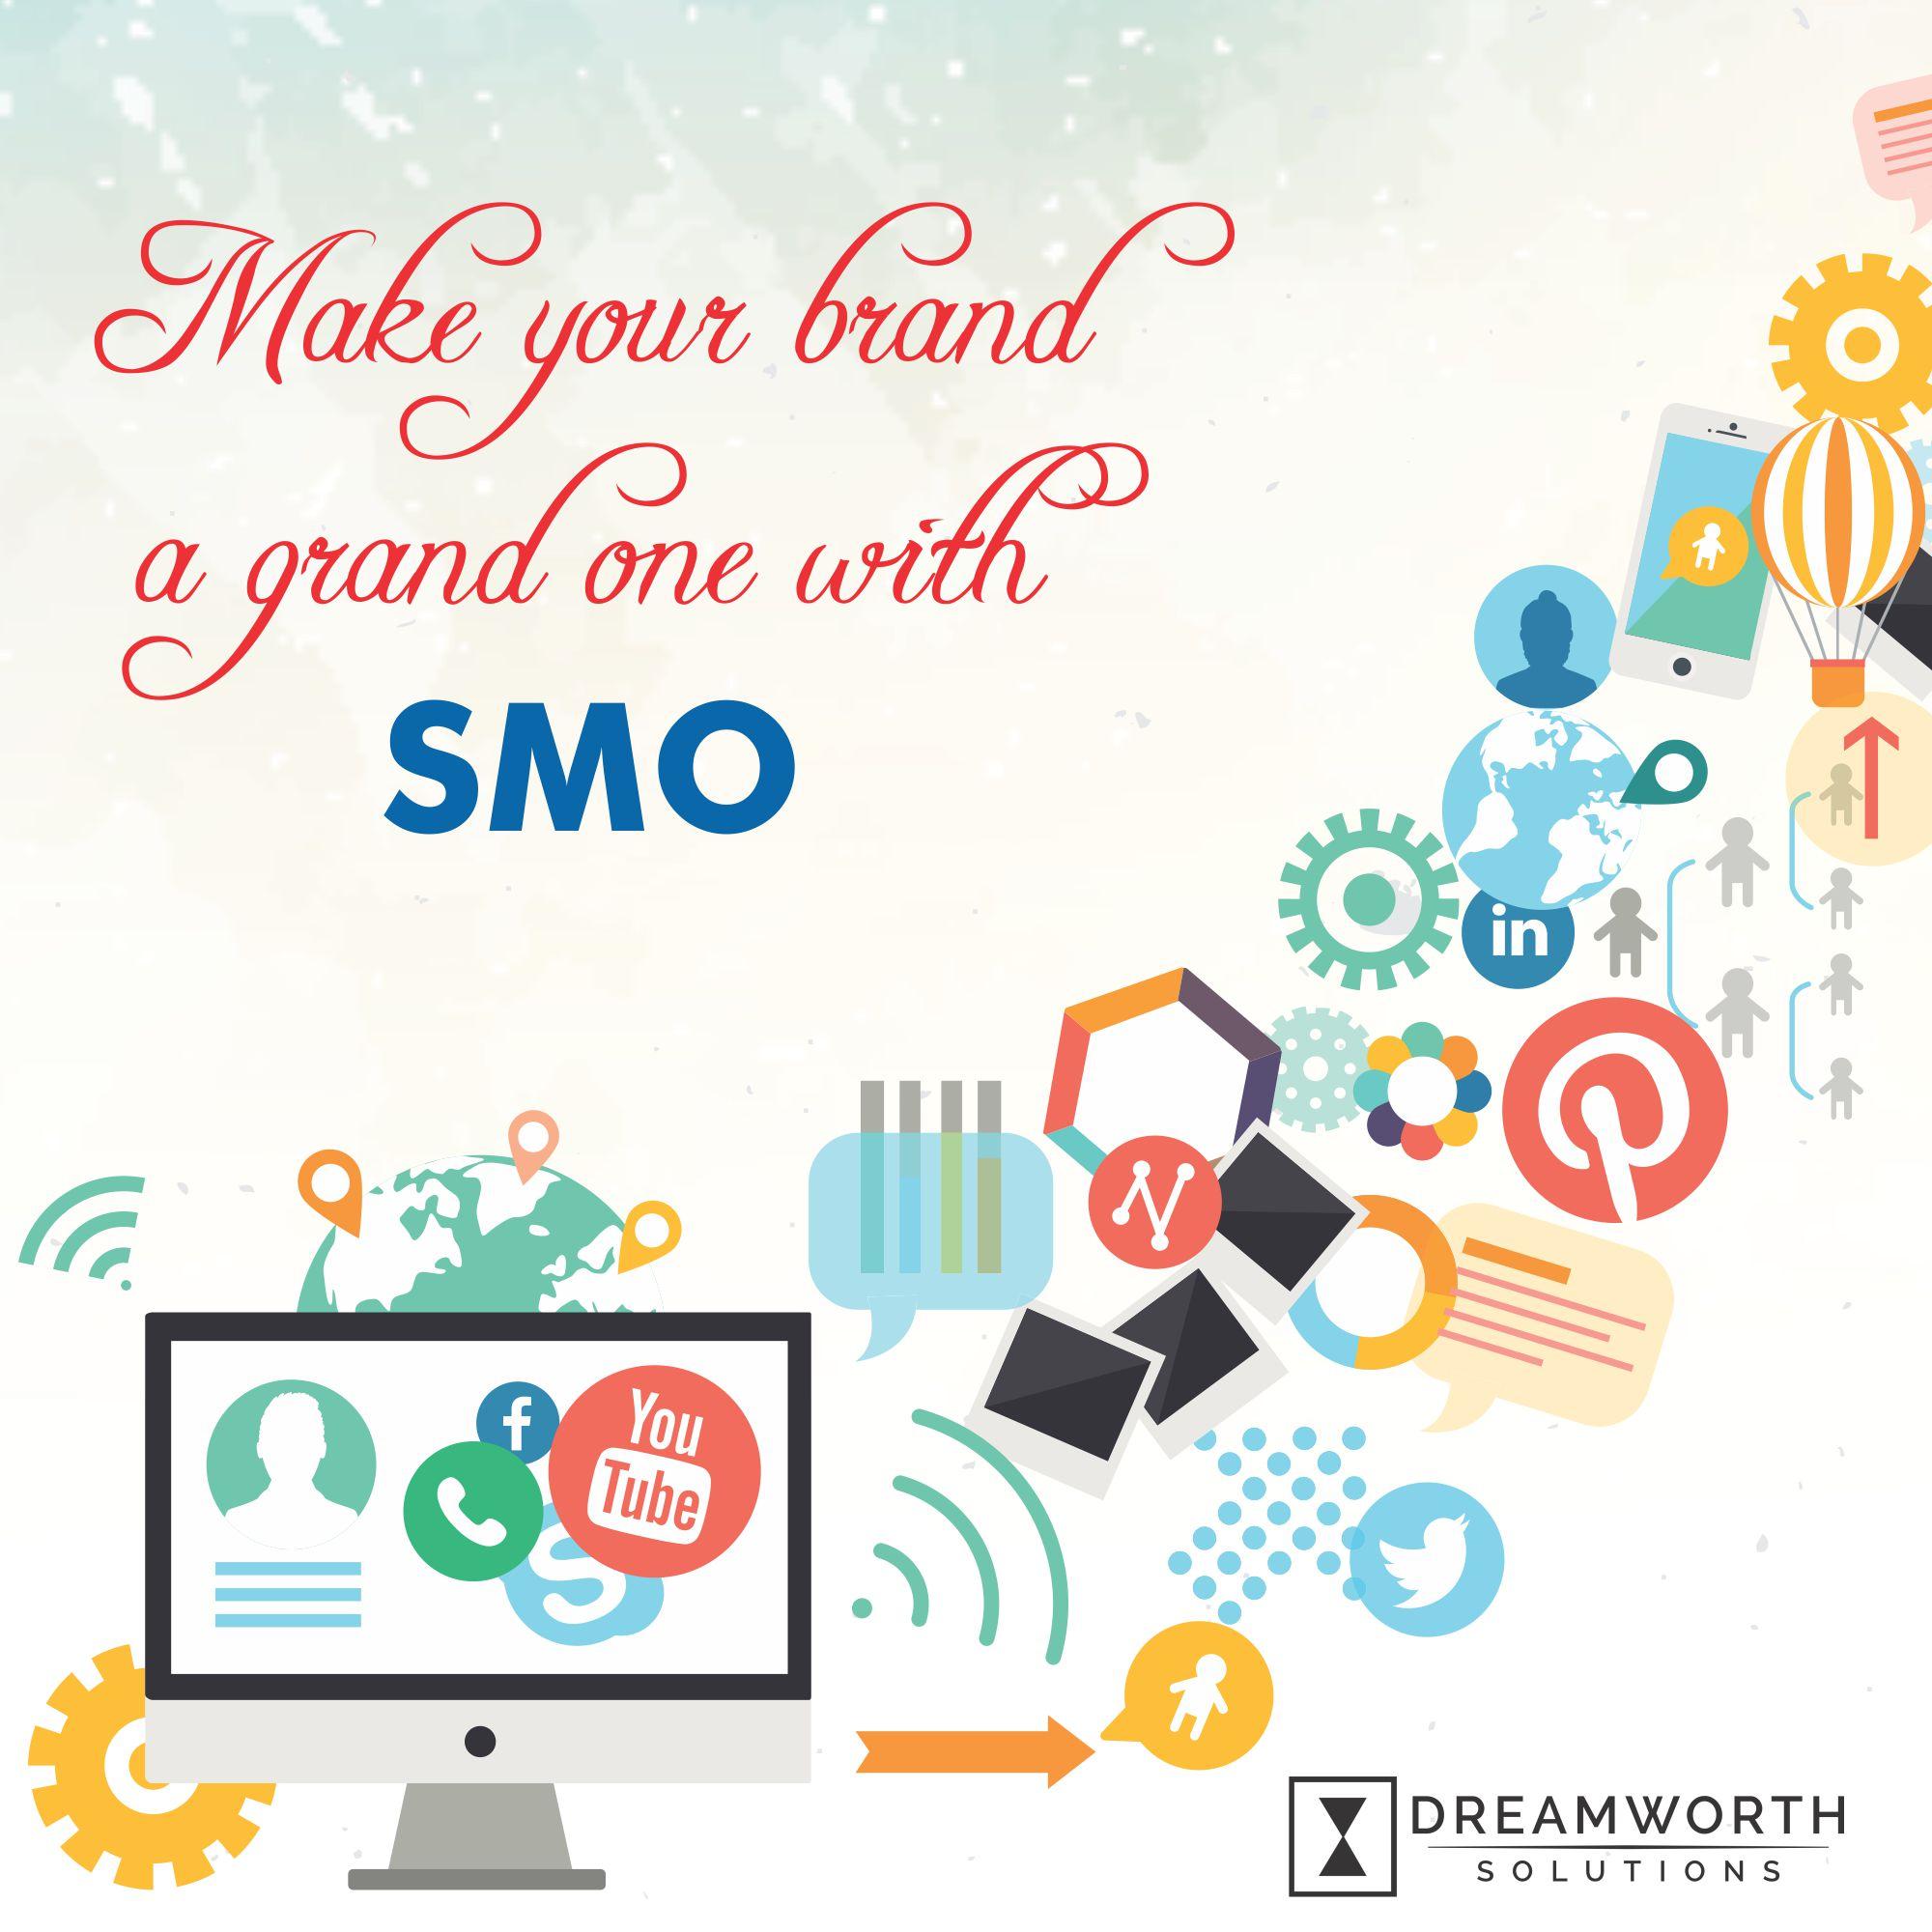 we offer innovative digital marketing solutions